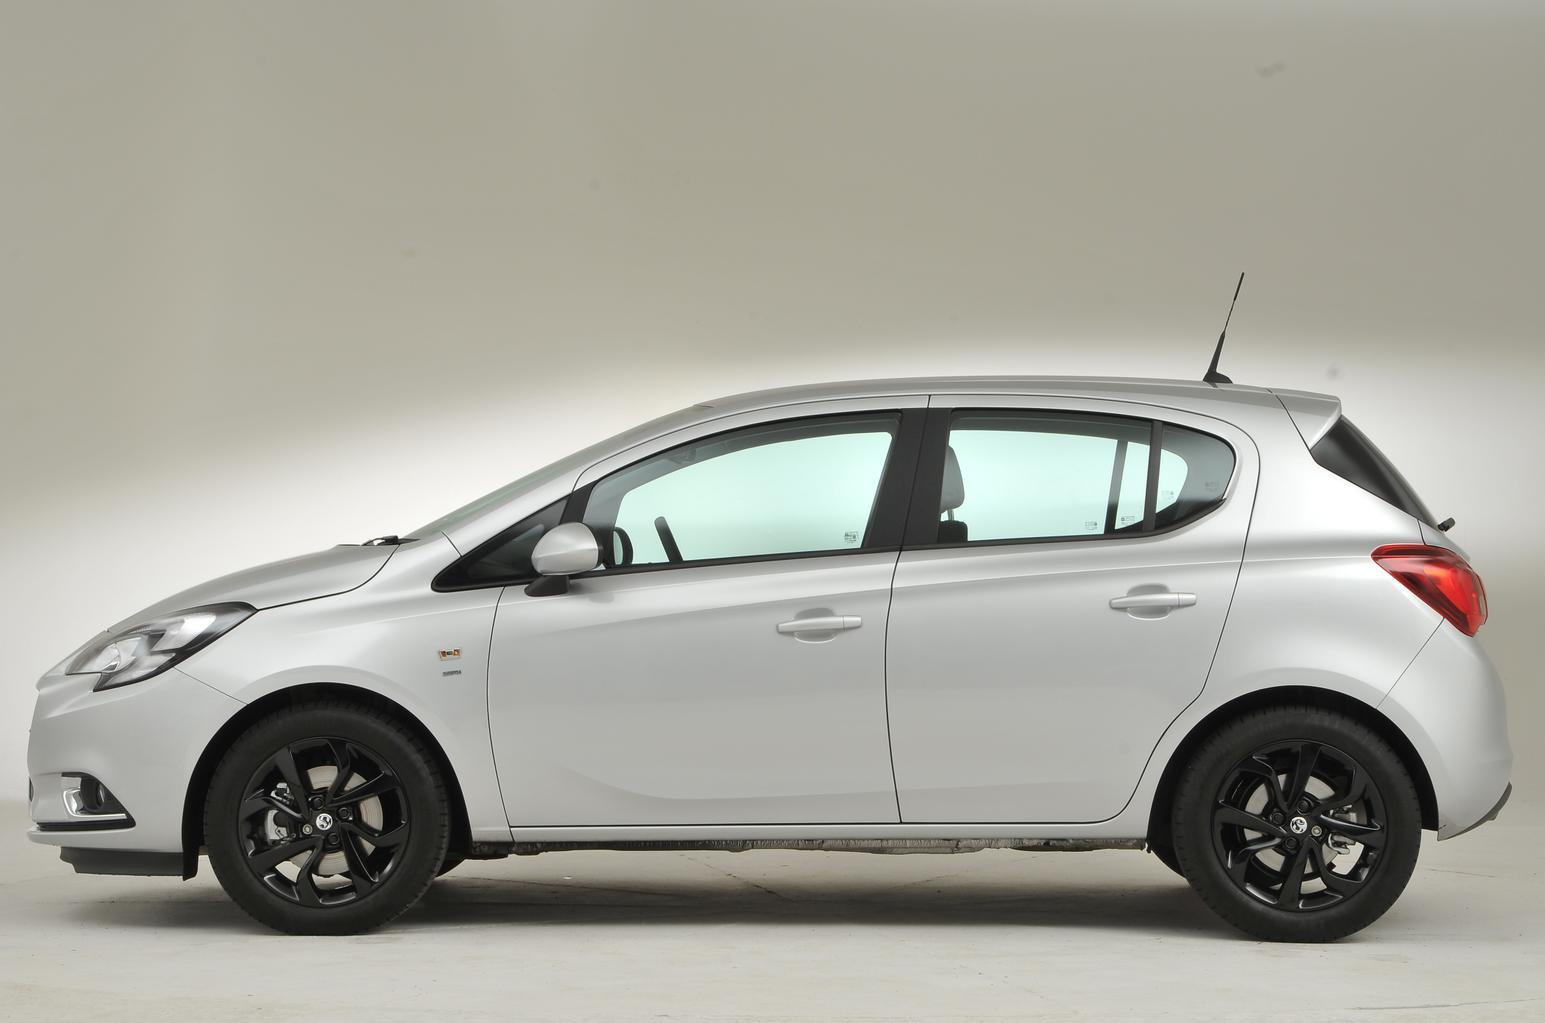 Used Vauxhall Corsa 2014-present